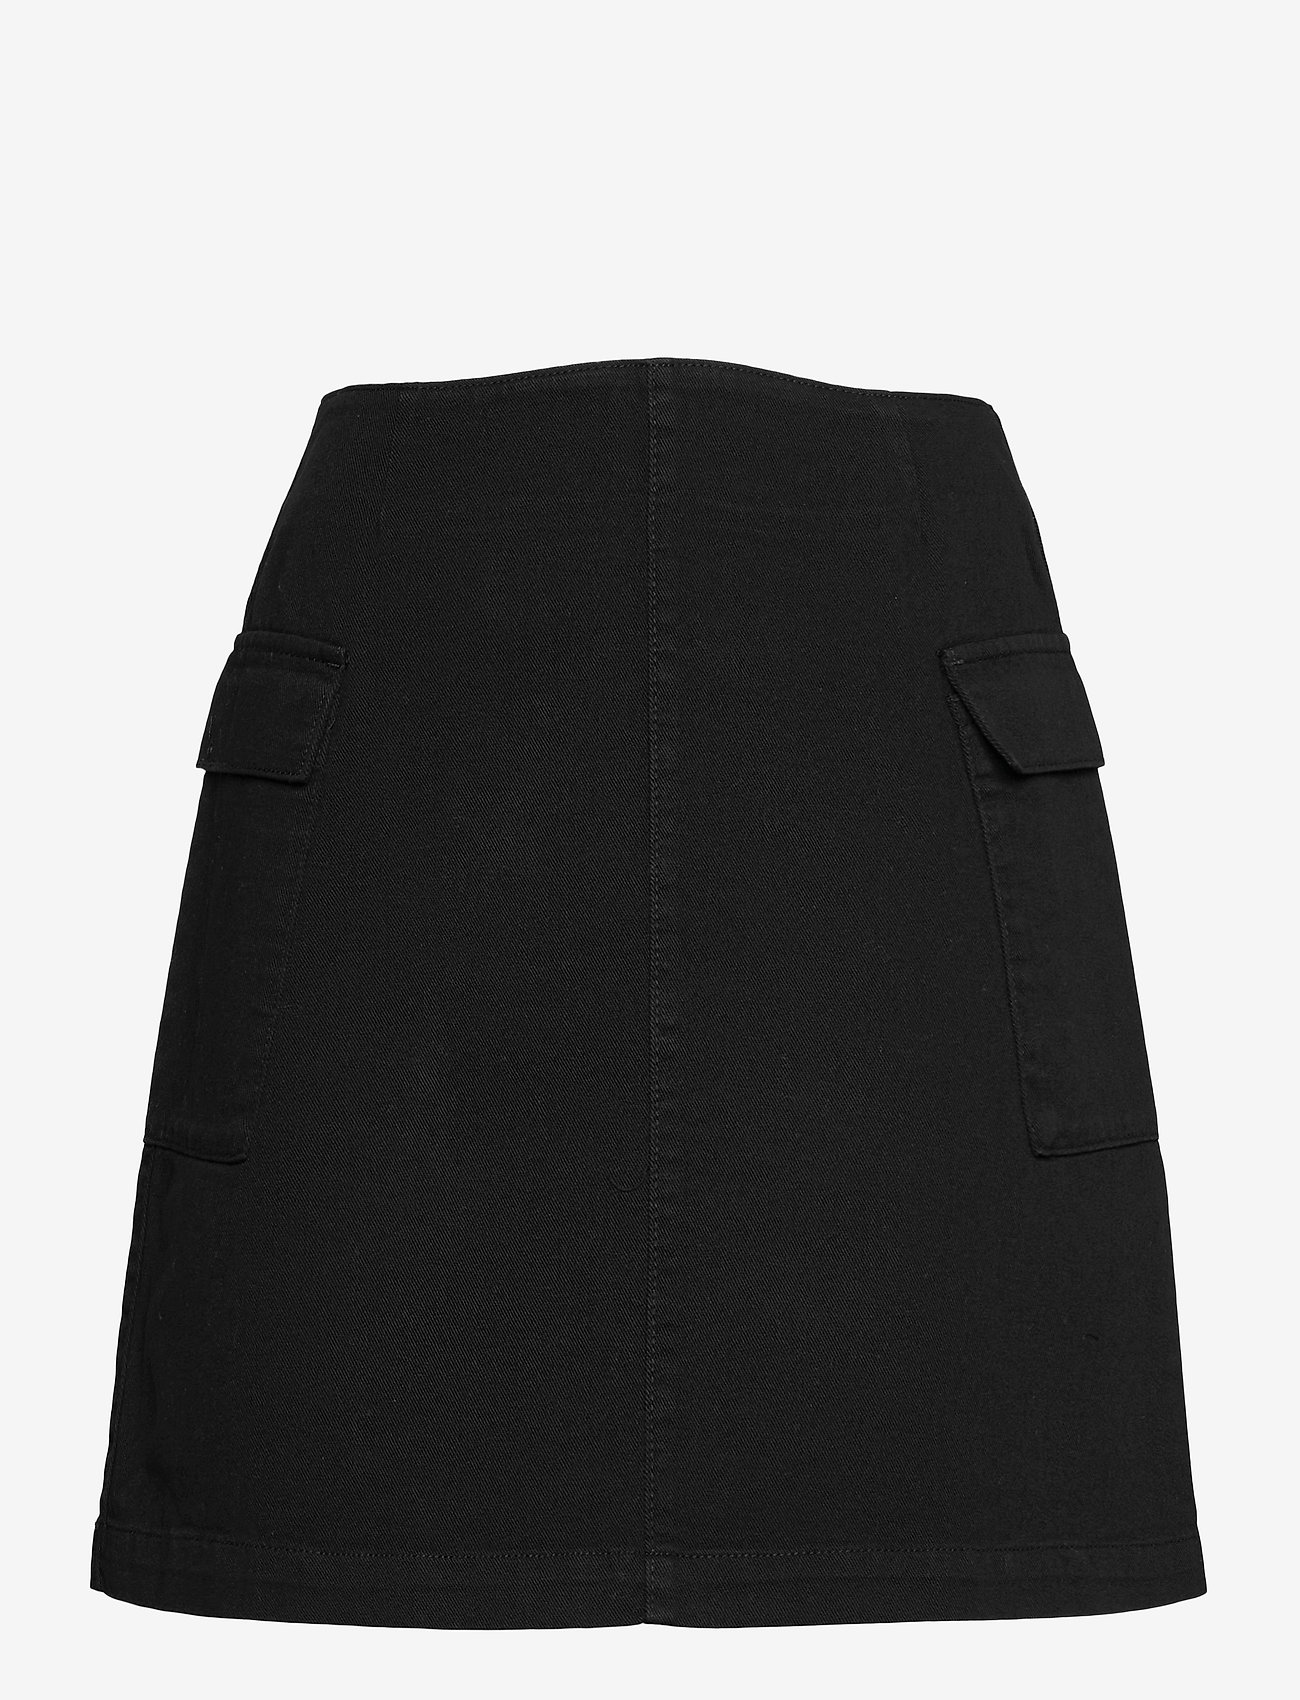 Carin Wester - Pixie - korta kjolar - black - 1